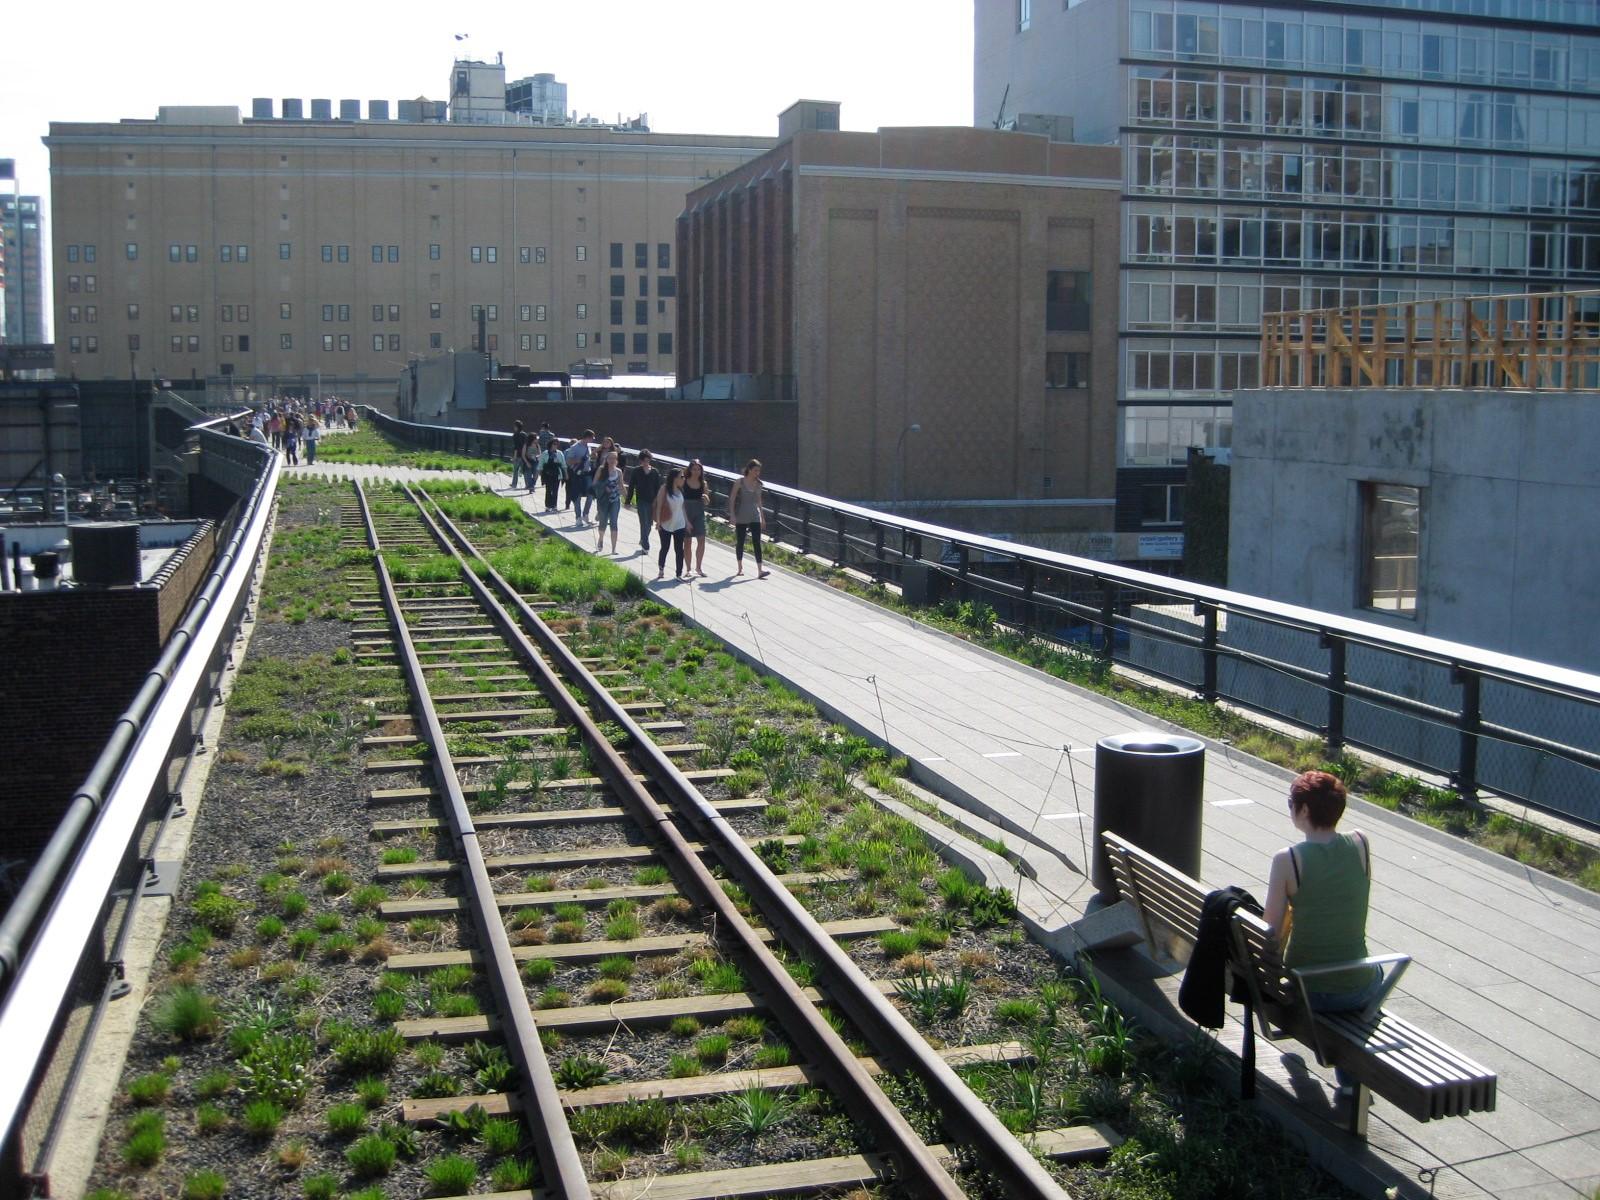 Reconstructed tracks at 20th Street Źródło en.wikipedia.org